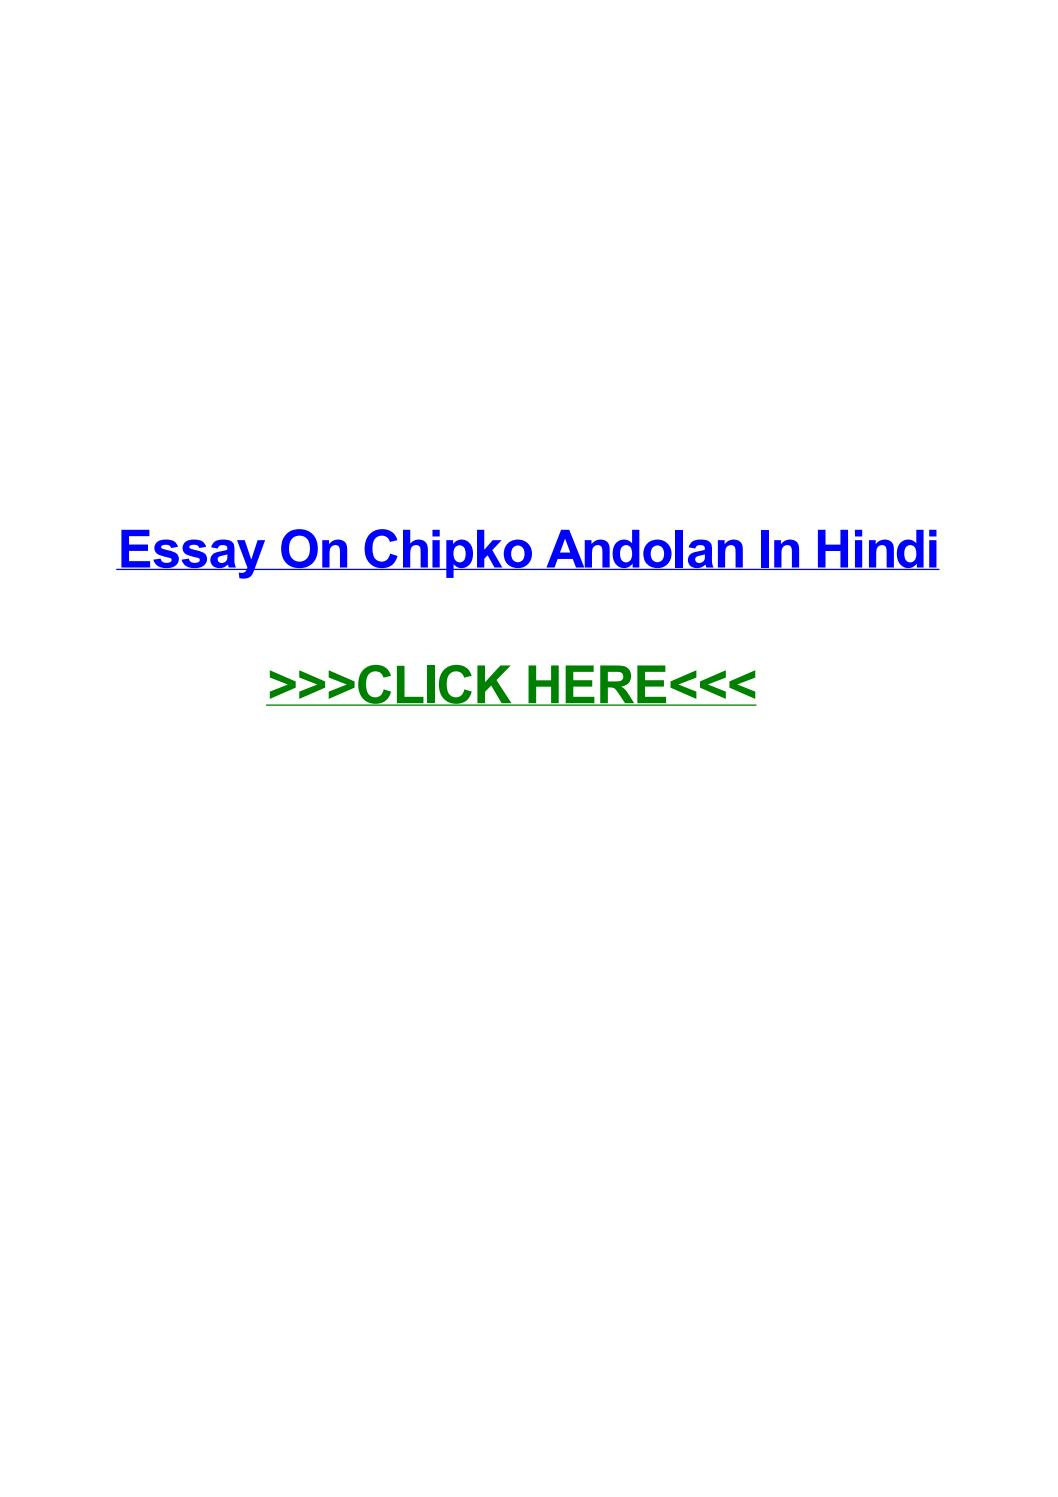 006 Essay Example Page 1 Chipko Imposing Movement In Kannada Language Hindi Andolan Full